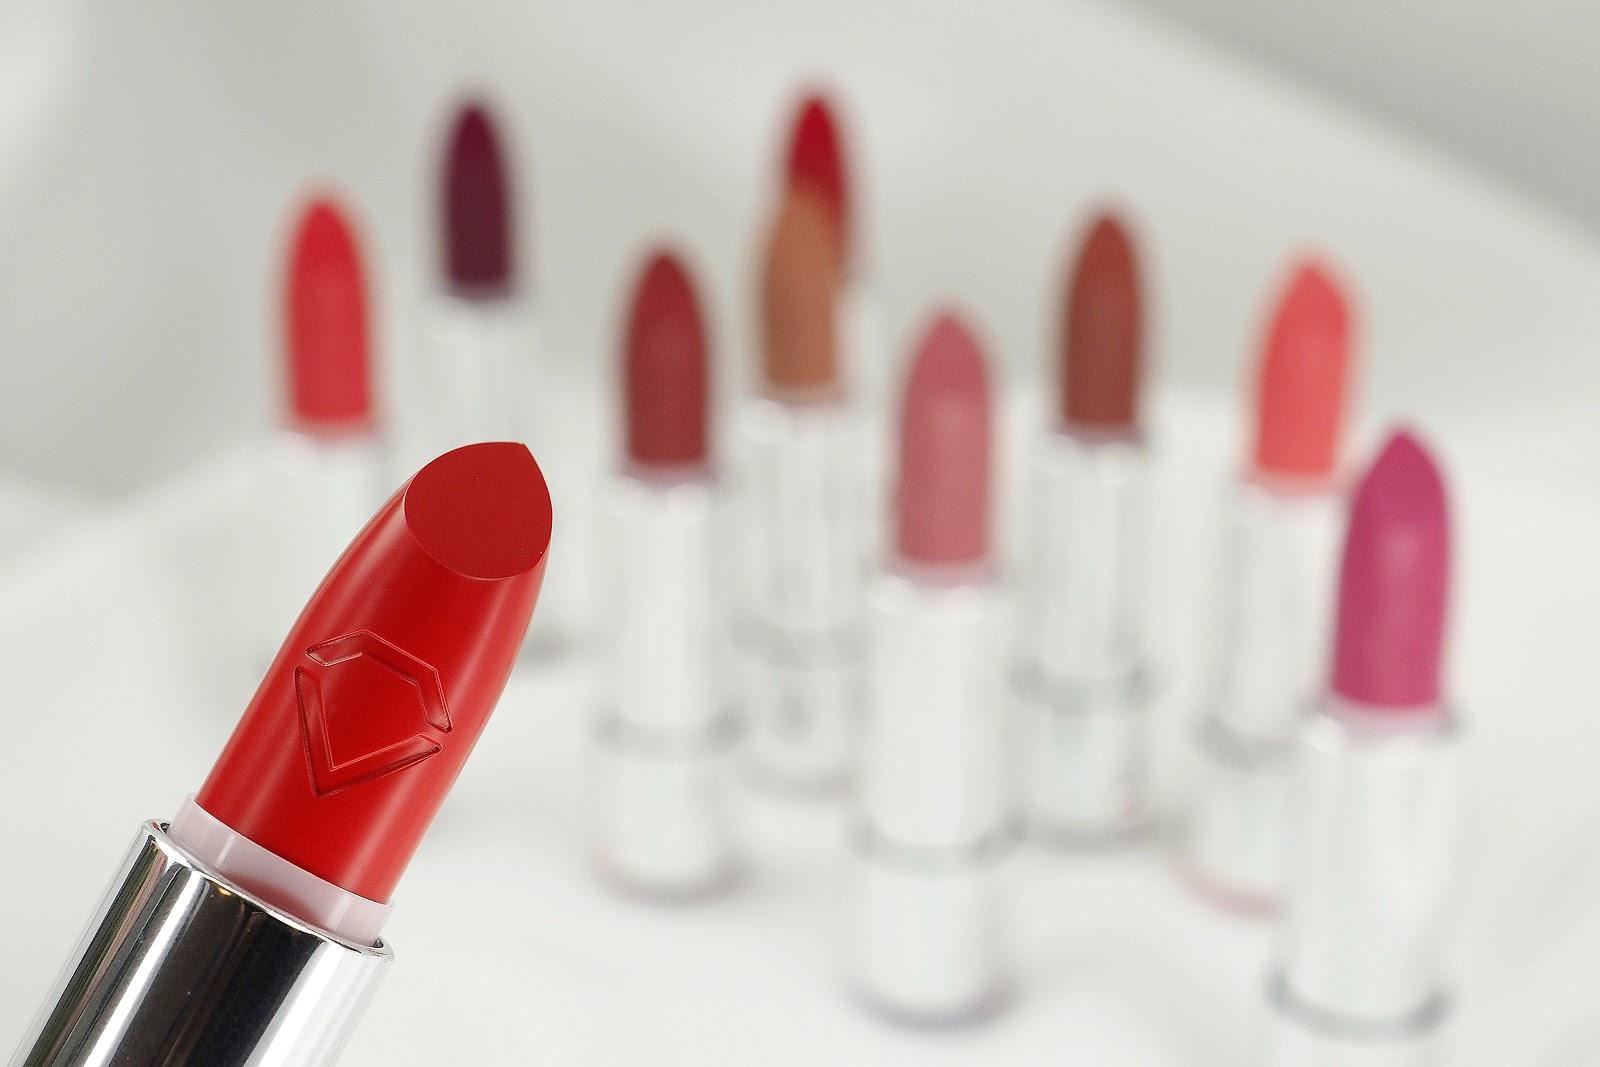 szminki classy lips